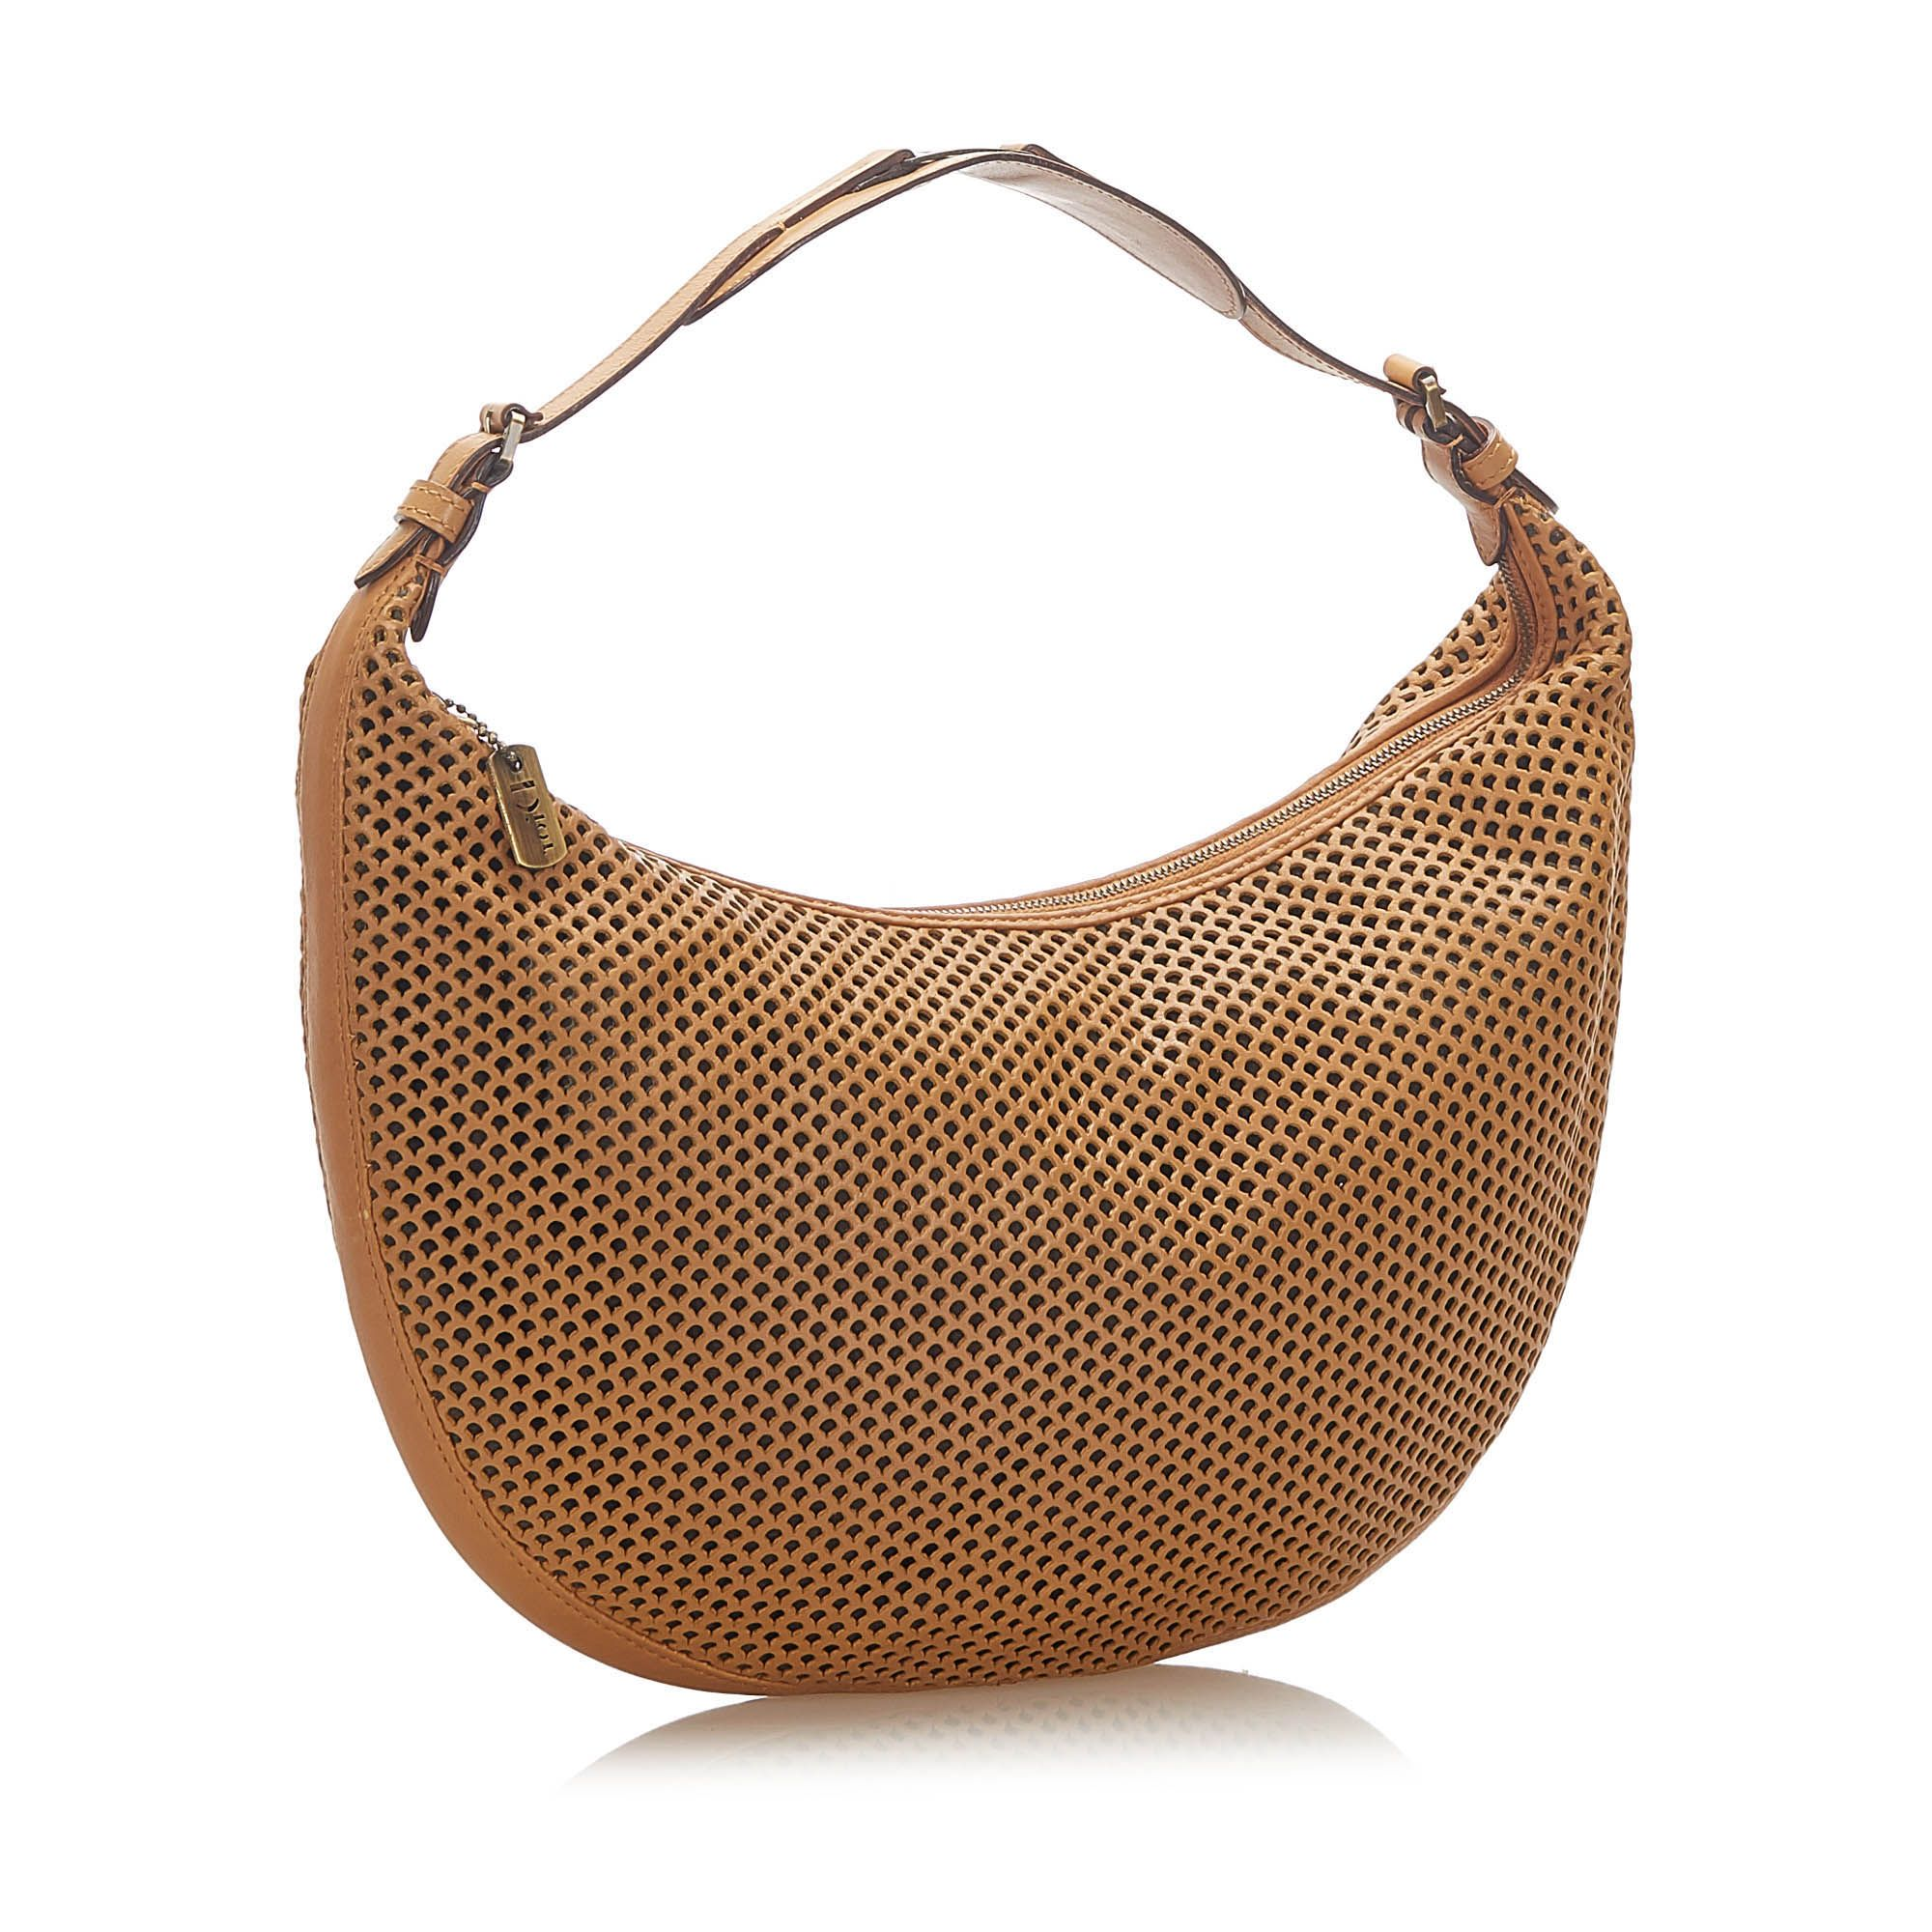 Vintage Dior Perforated Leather Hobo Bag Brown